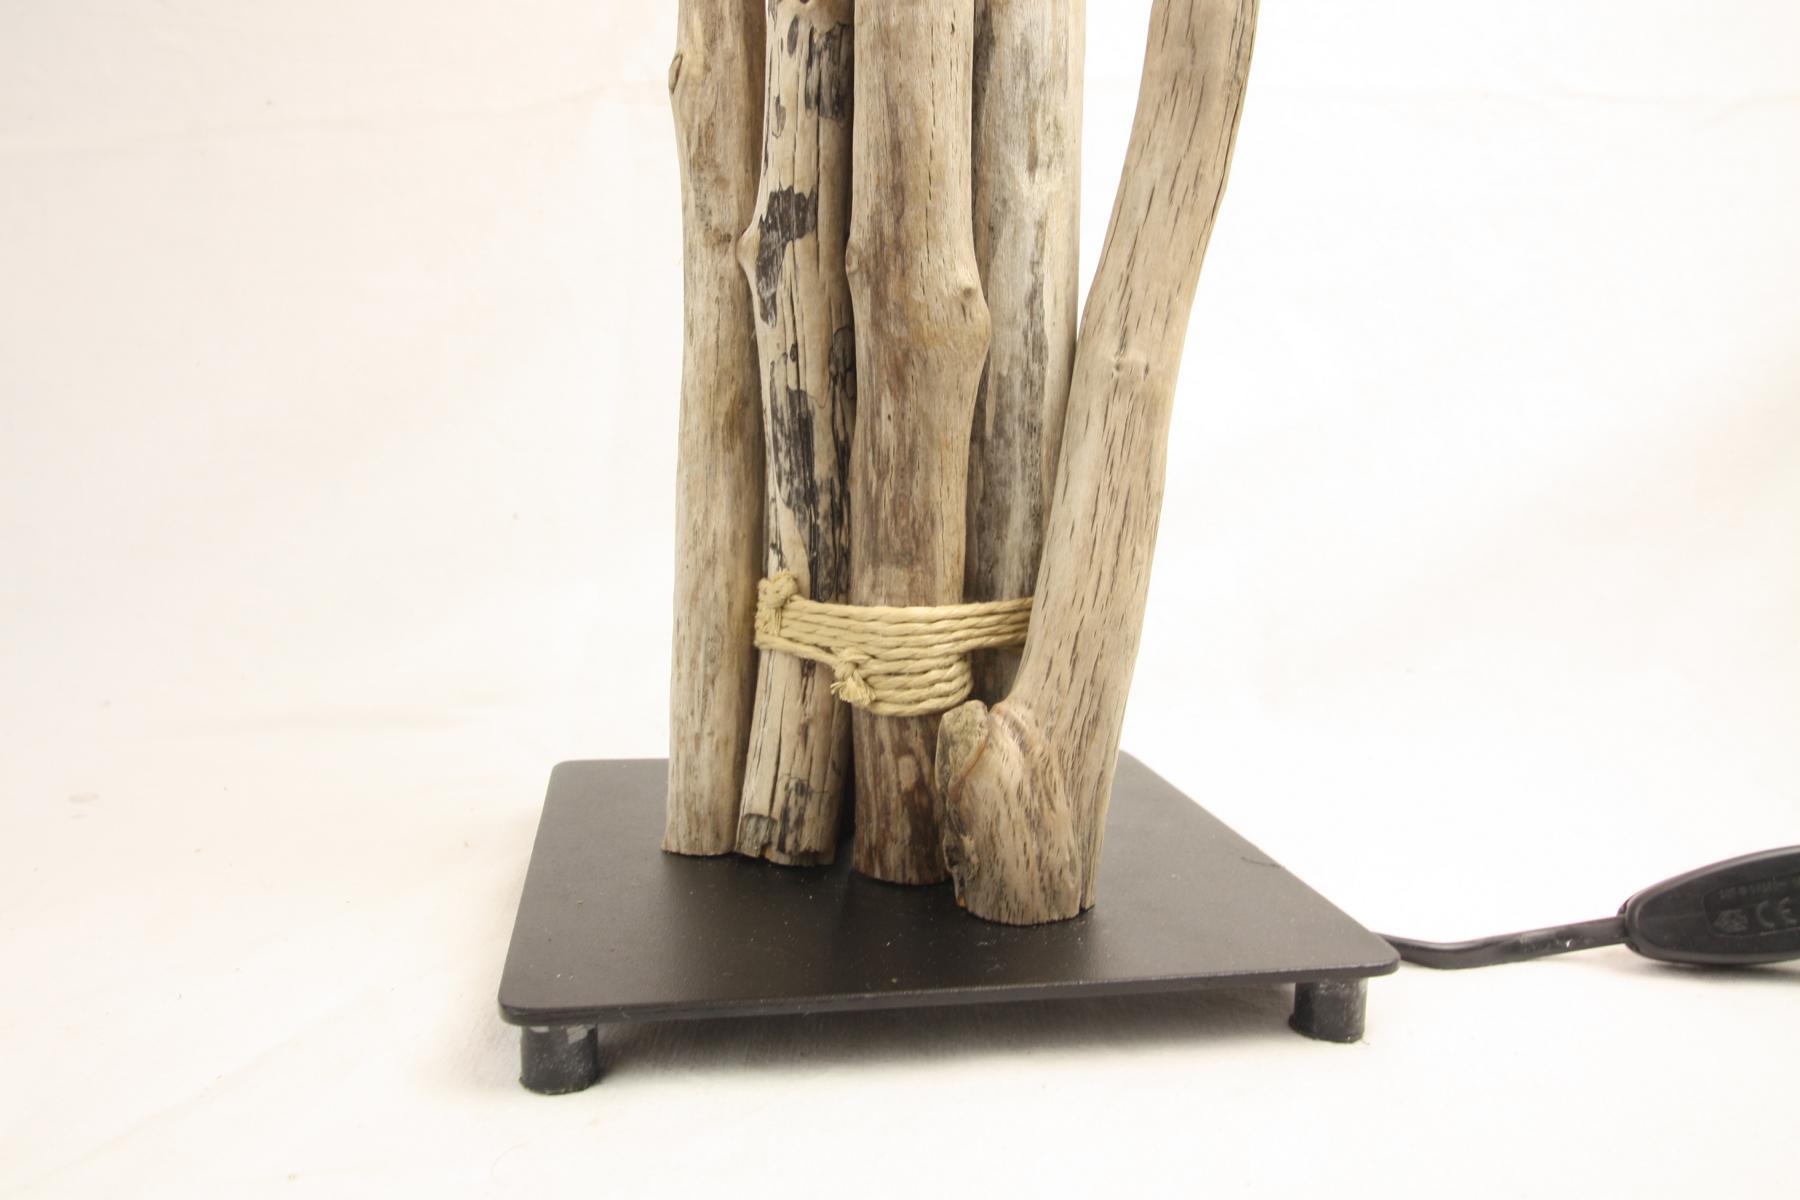 treibholz lampe mit schirm tischlampe unikat. Black Bedroom Furniture Sets. Home Design Ideas